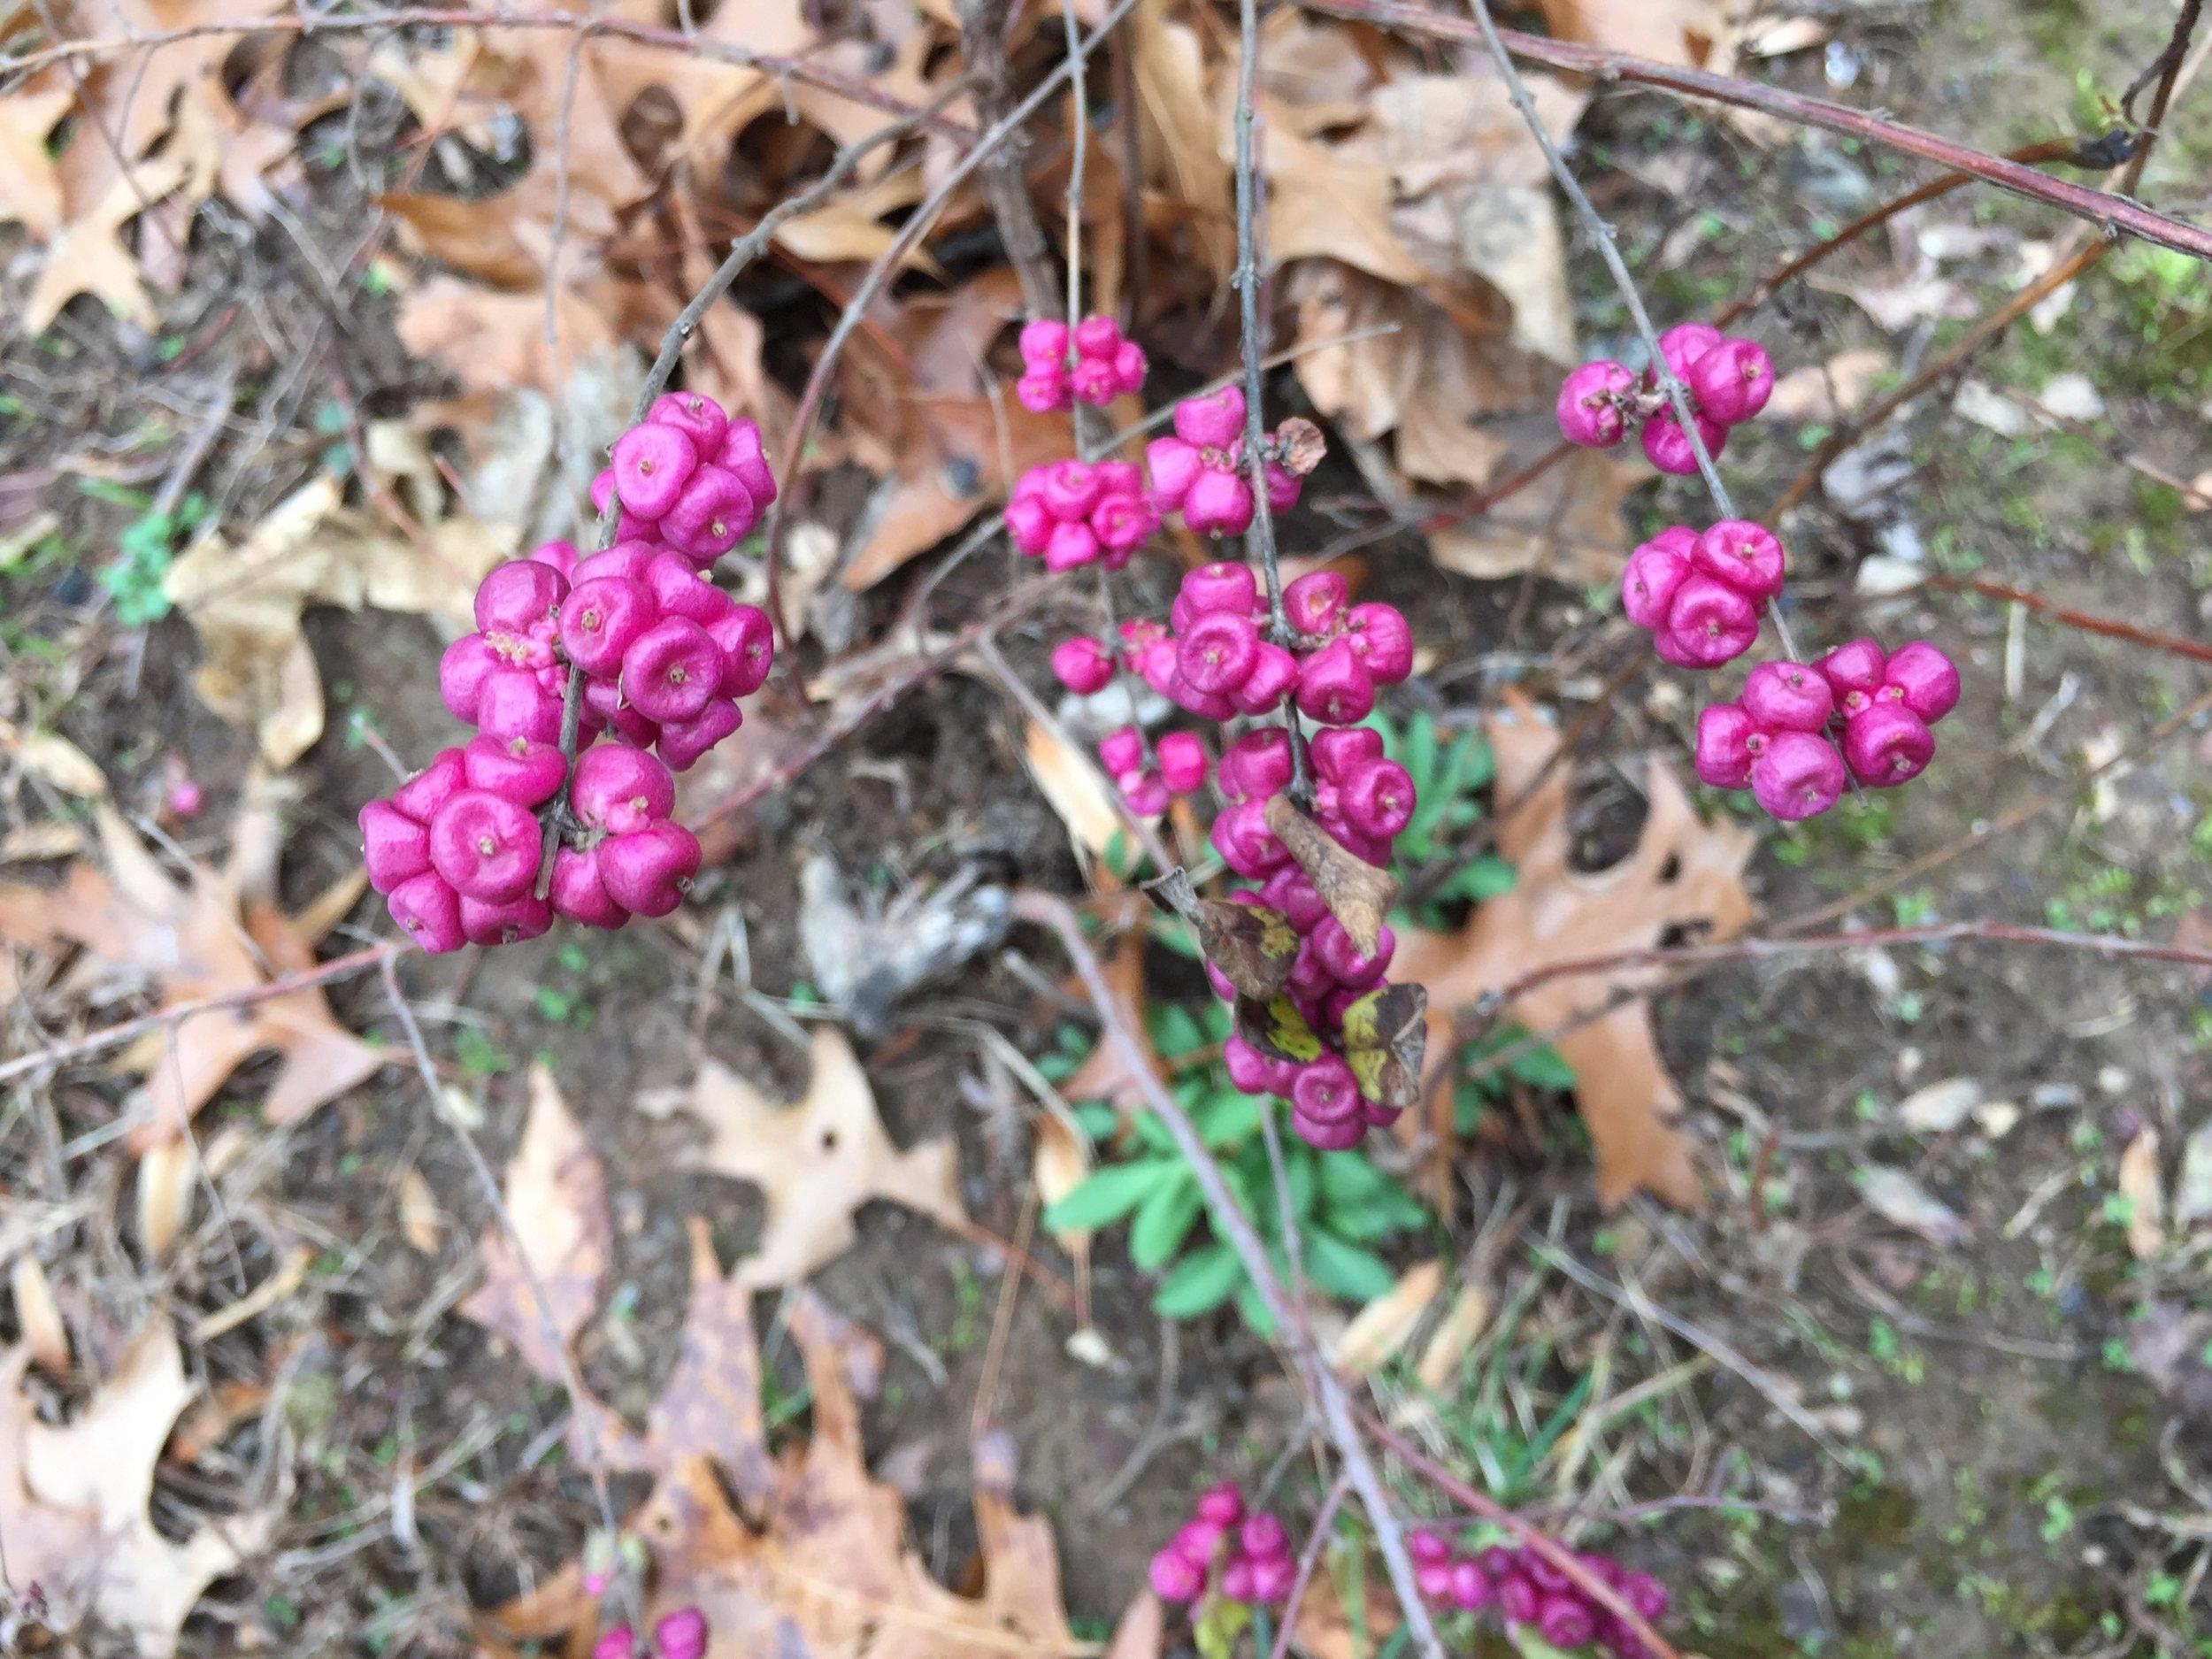 Coralberry, Symphoricarpos orbiculatus   By Famartin - Own work, CC BY-SA 4.0